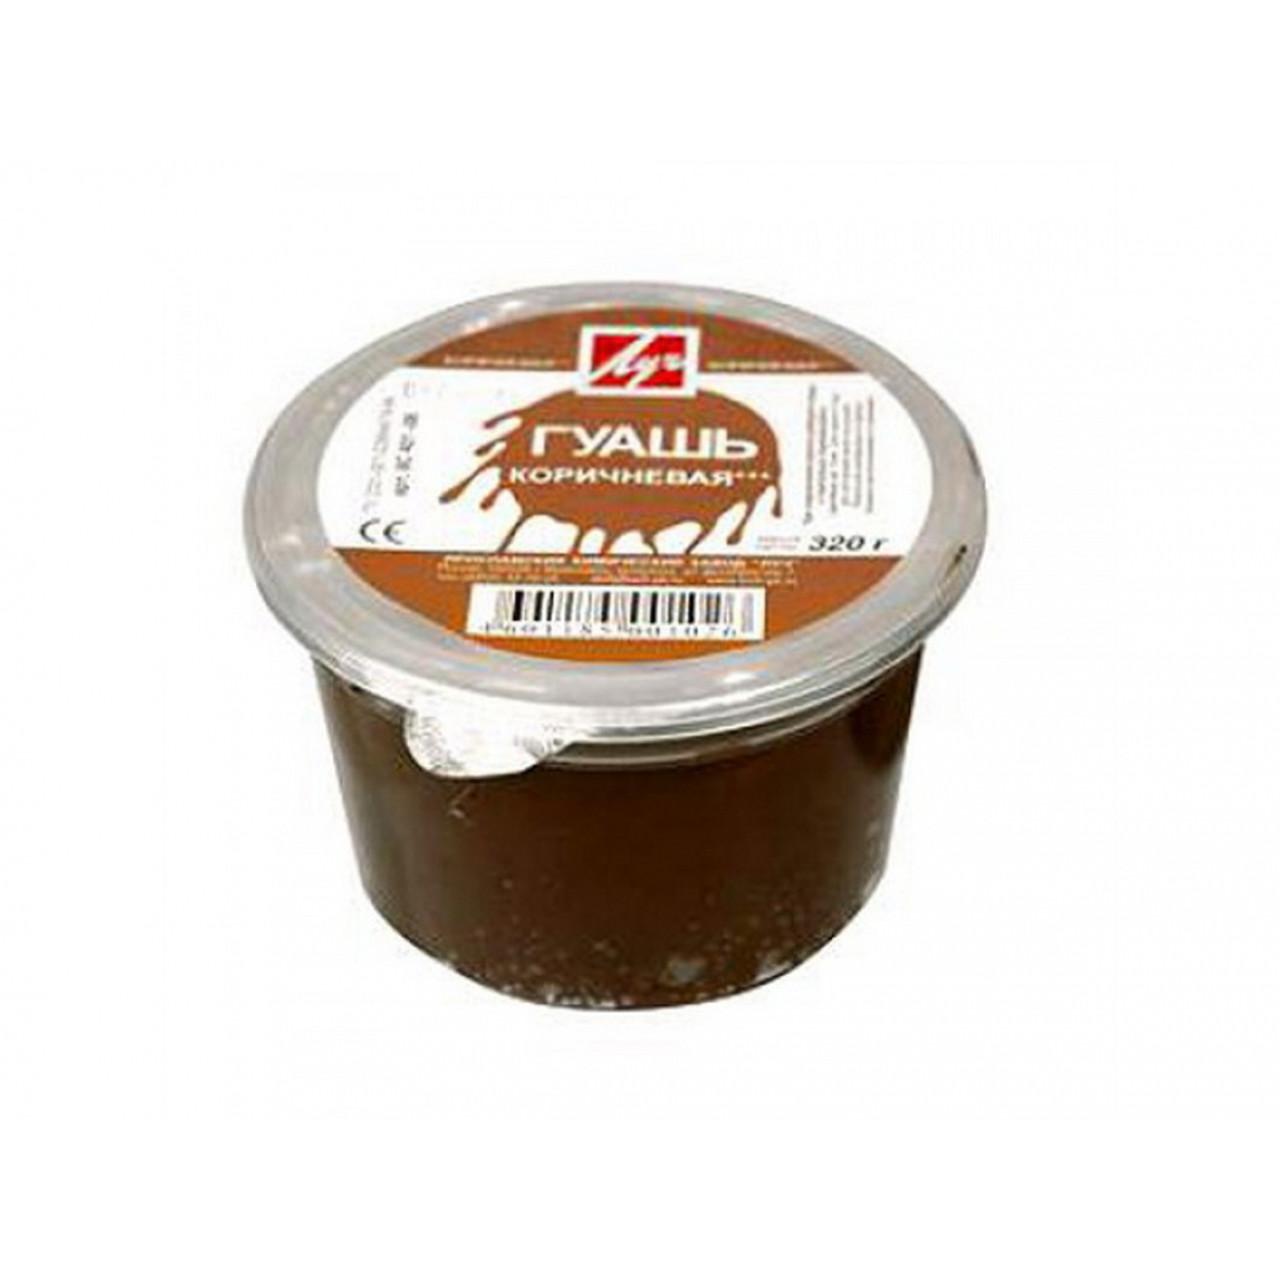 Гуаш коричнева 225 мл, 0.32 кг 8С401-08